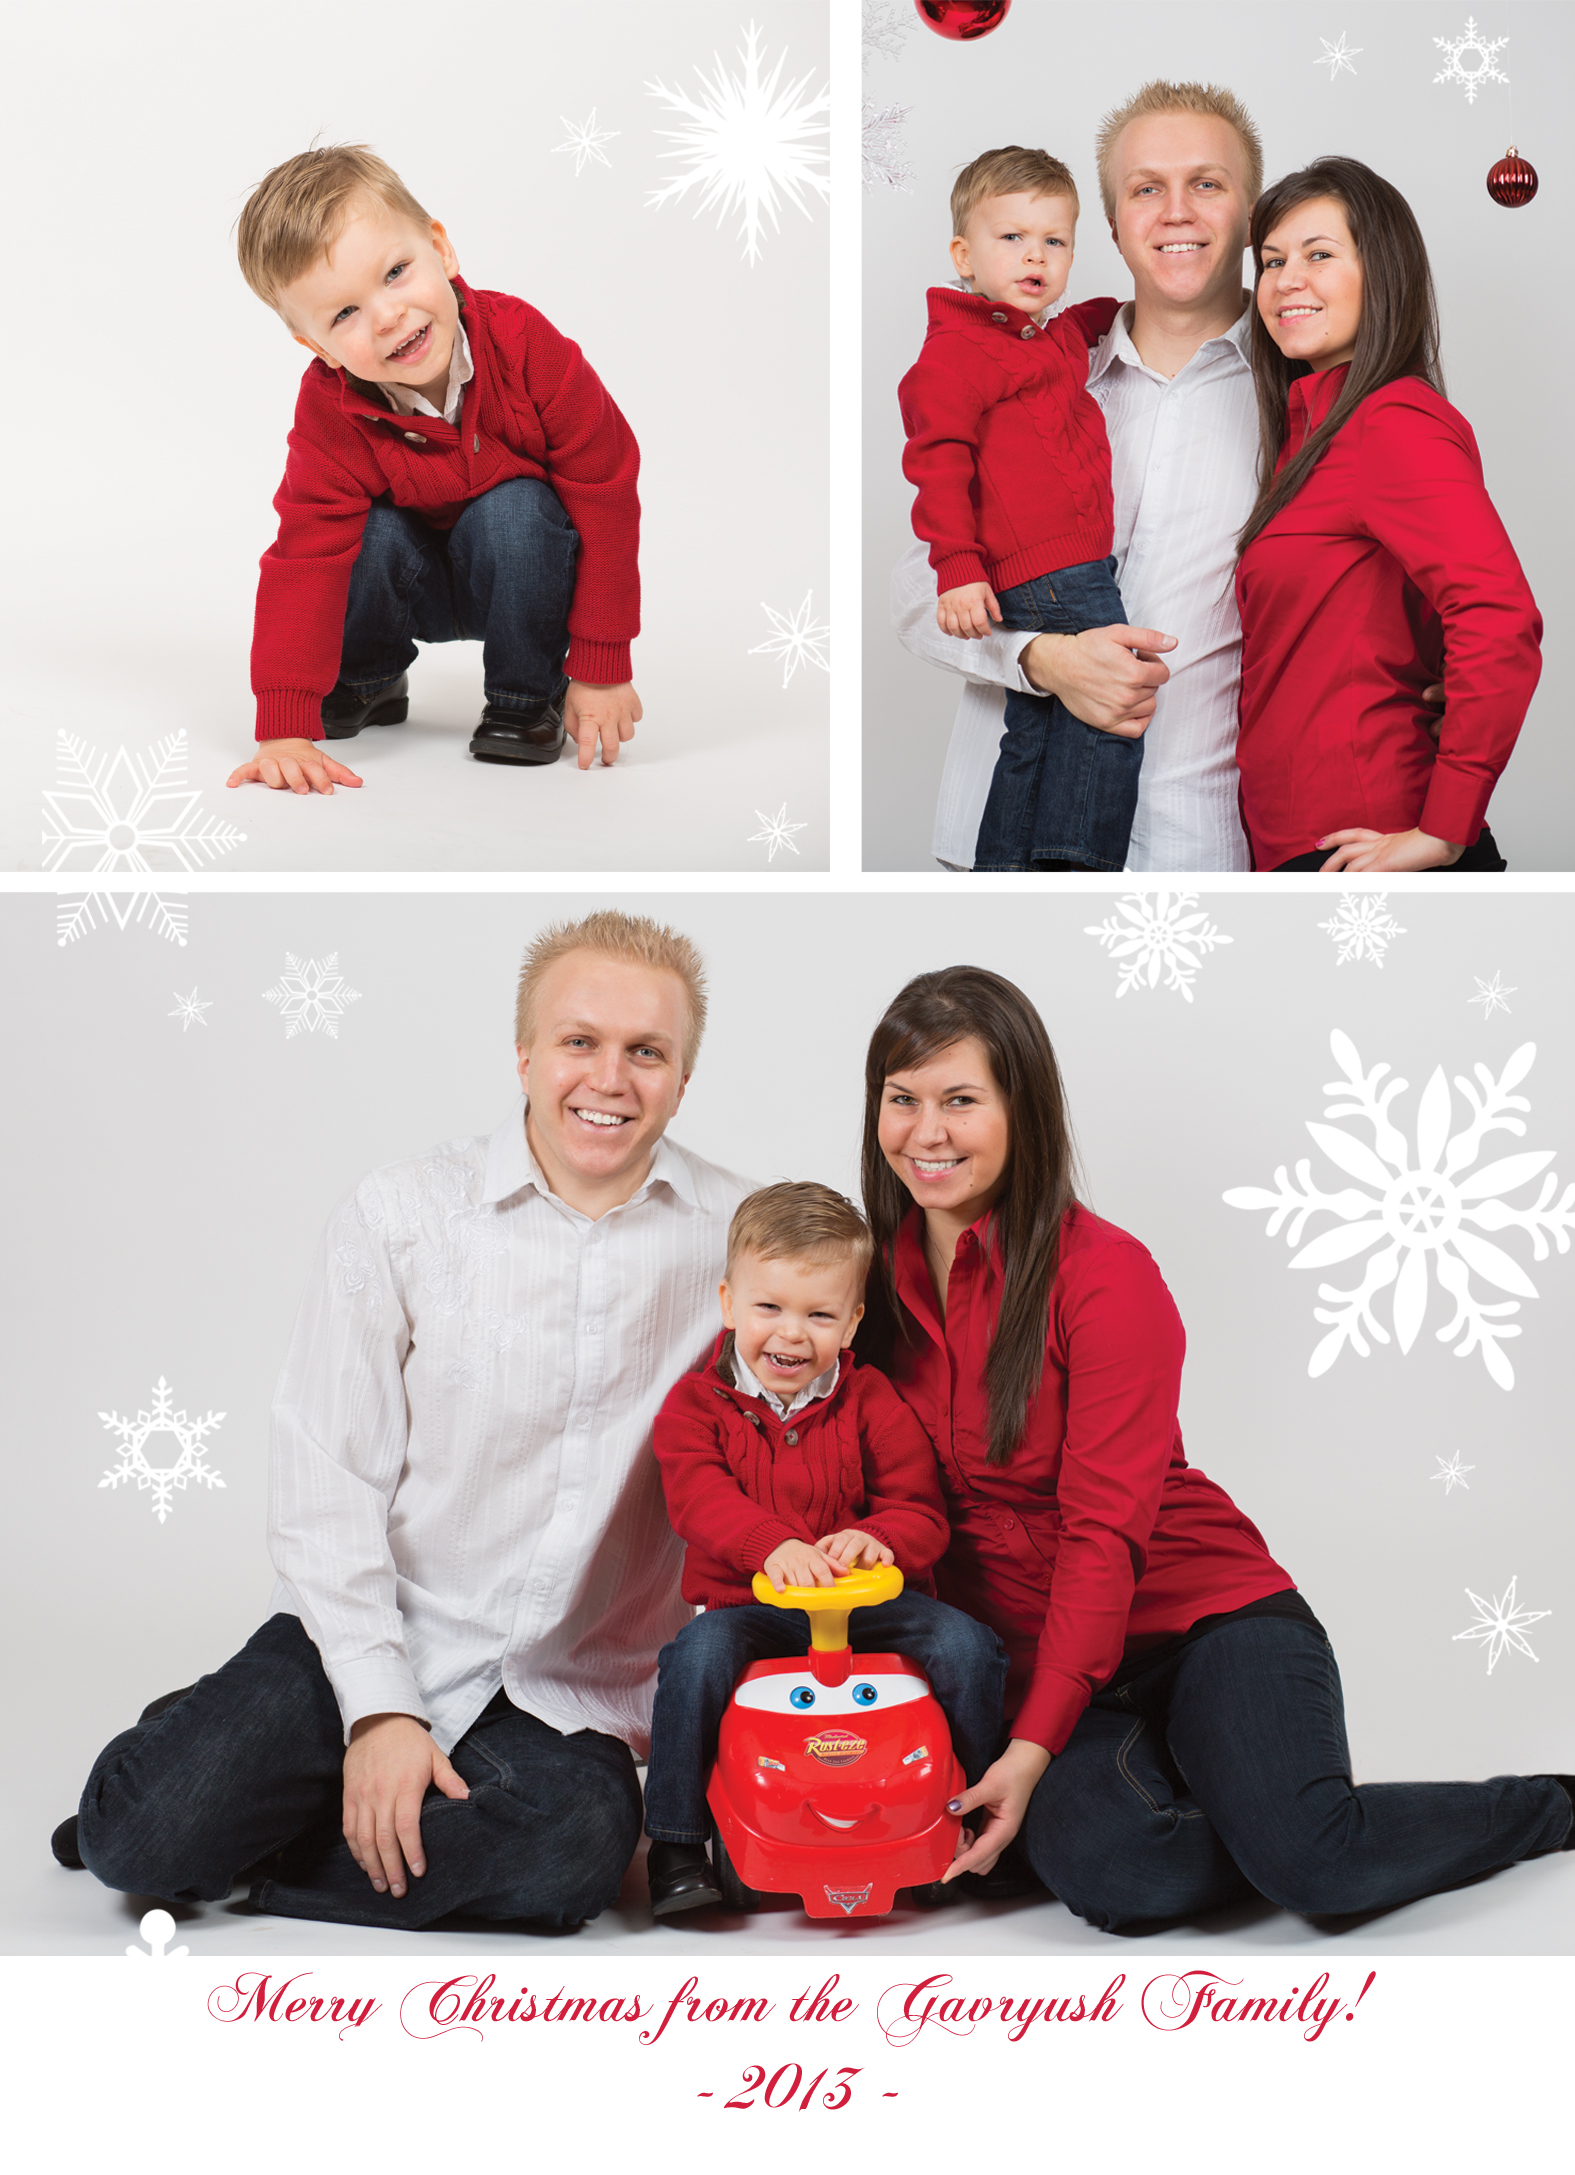 ChristmasCard2014.jpg